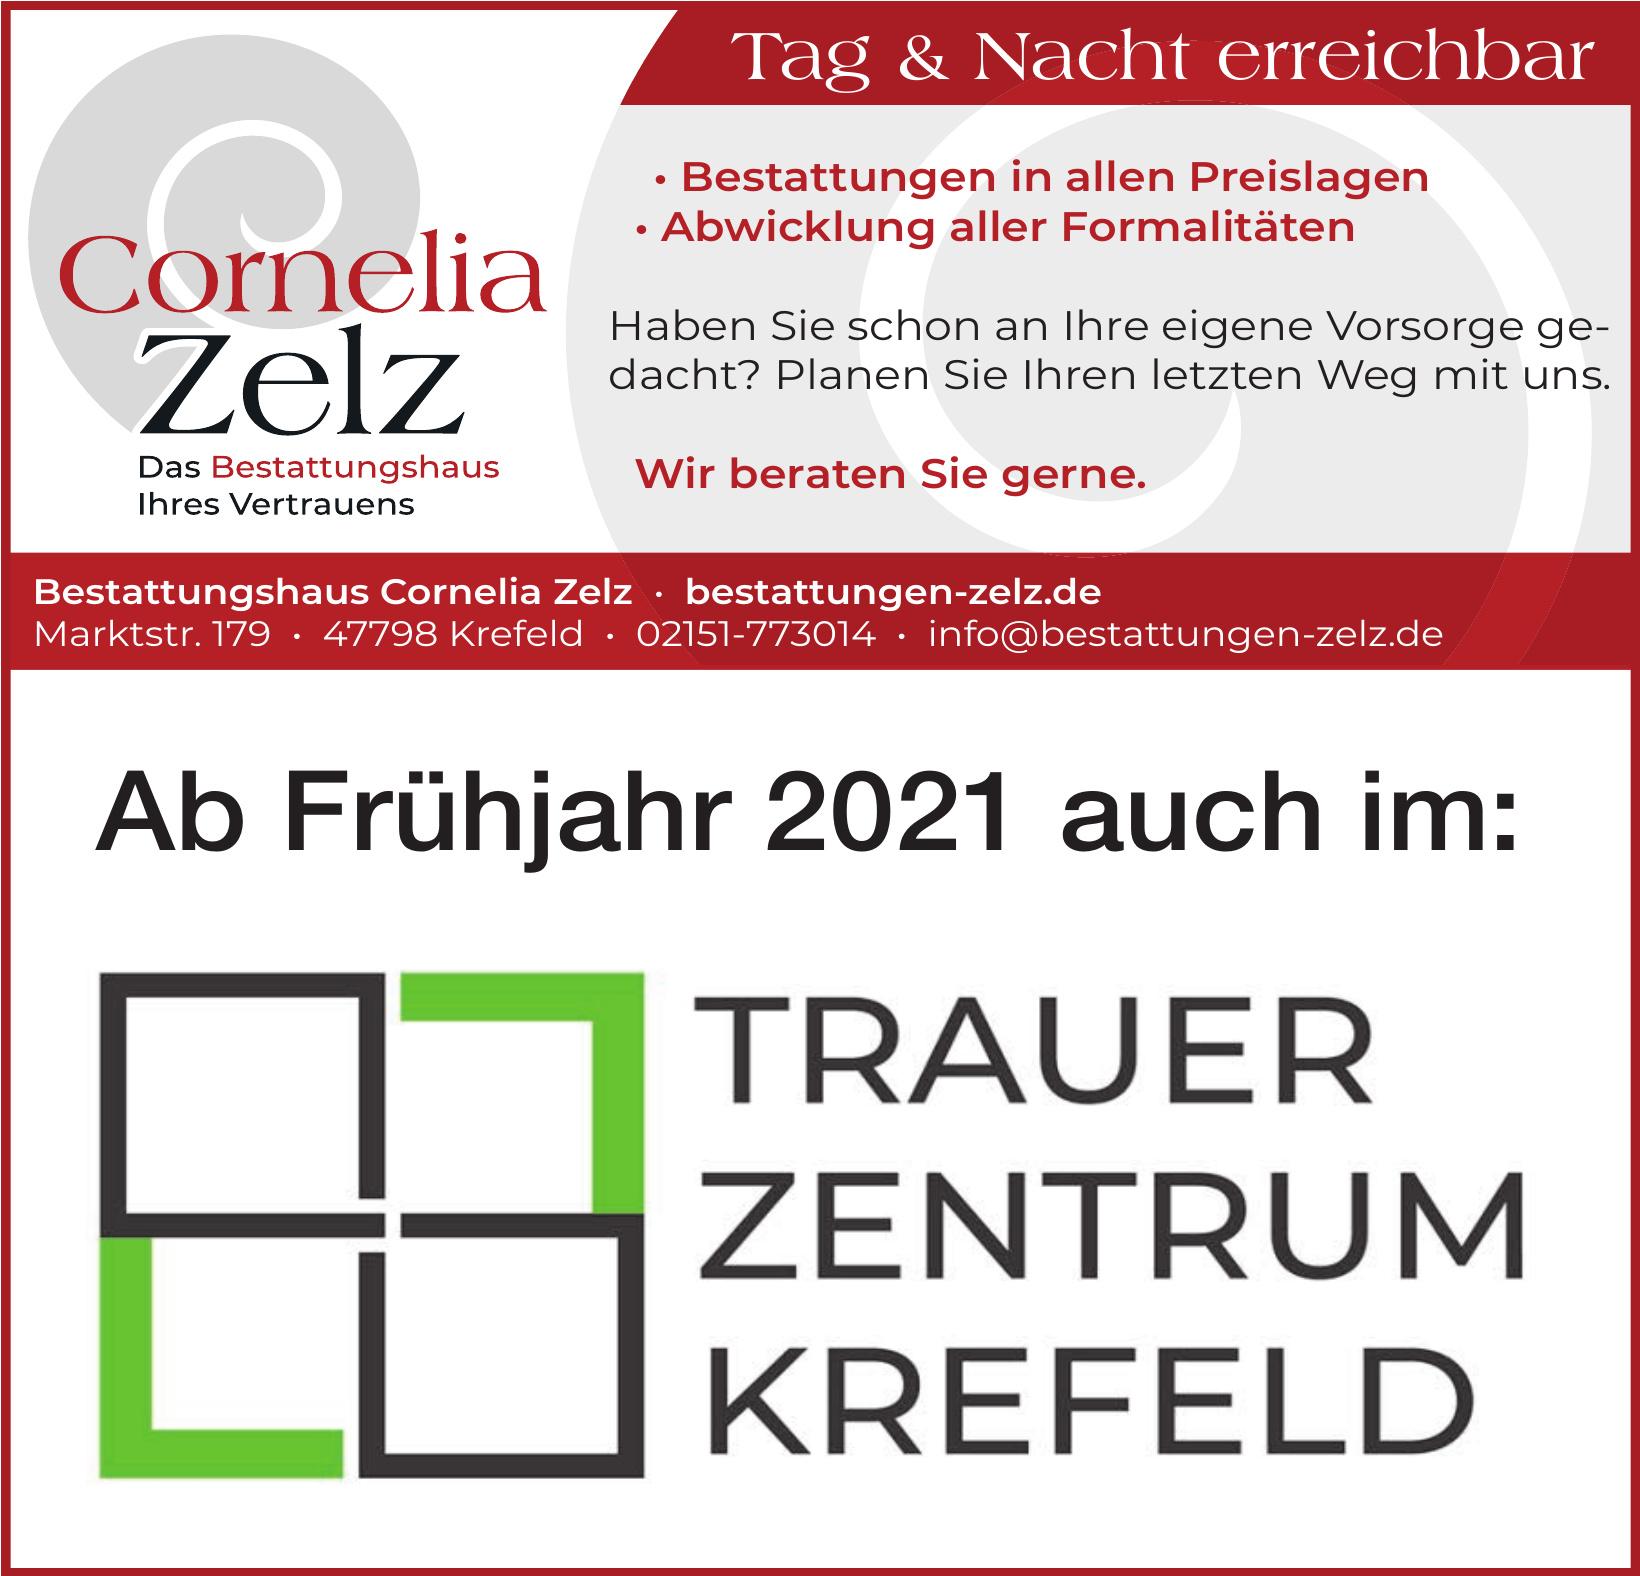 Bestattungshaus Cornelia Zelz